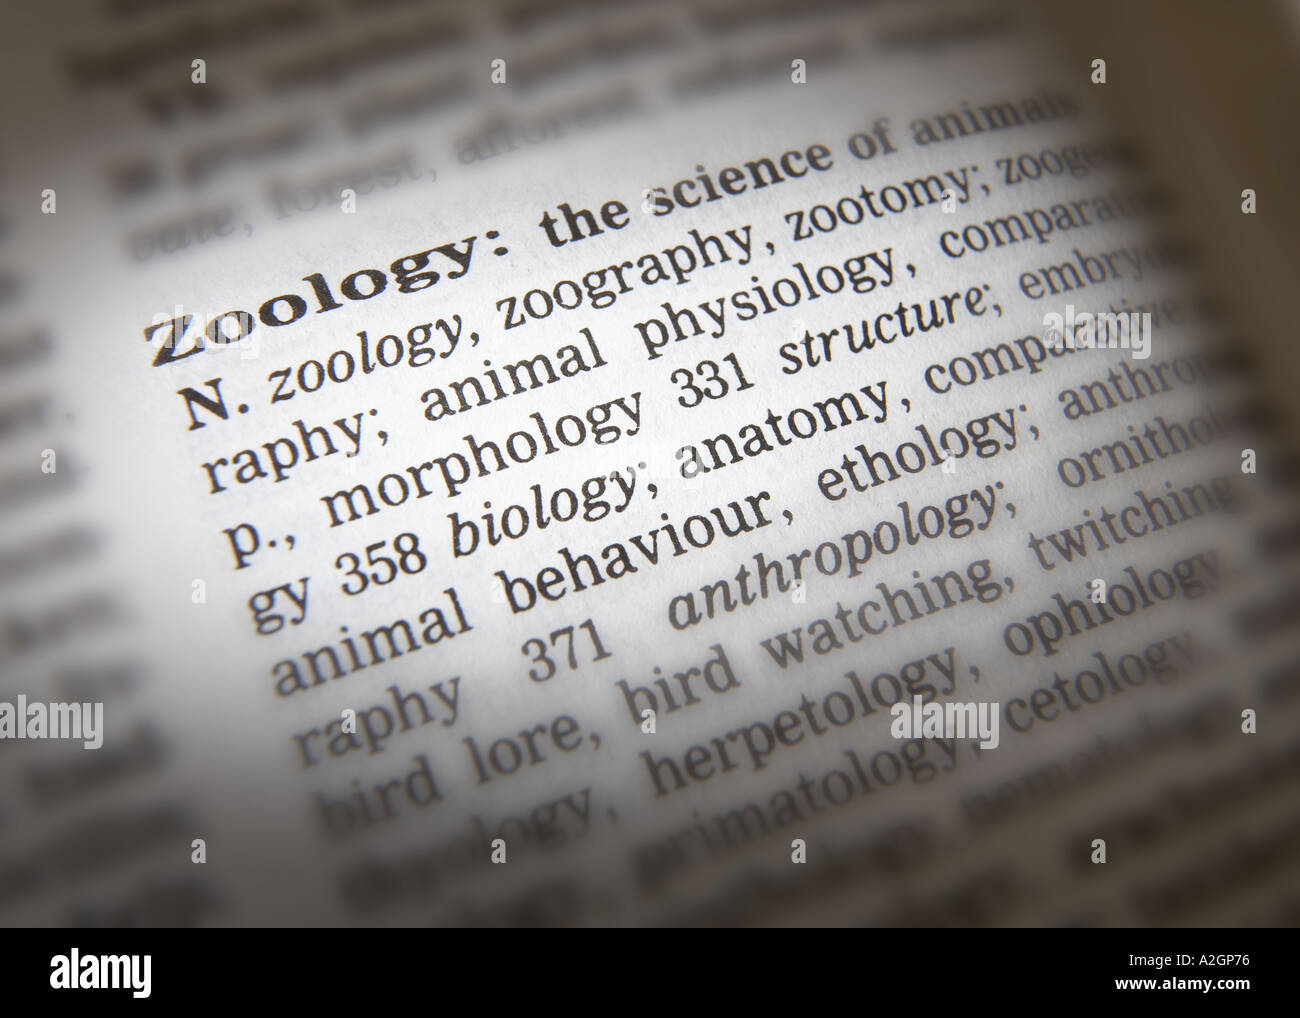 Electrophysiology study definition thesaurus